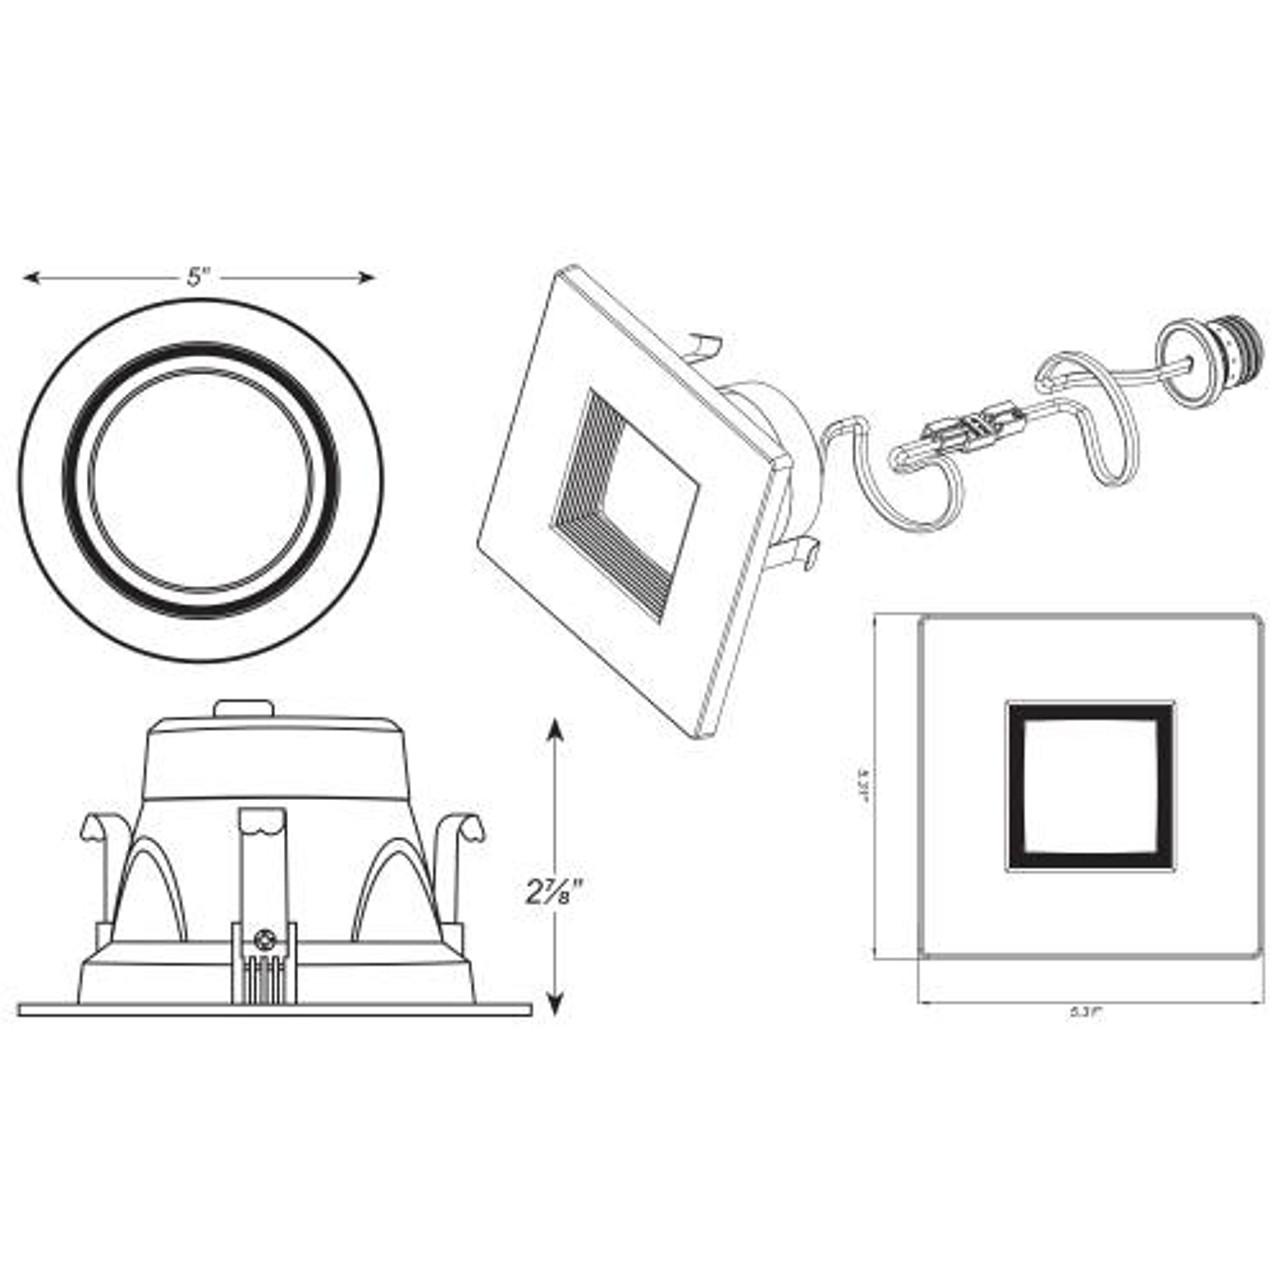 4 inch LED Retrofit Downlight Square Trim Line Art